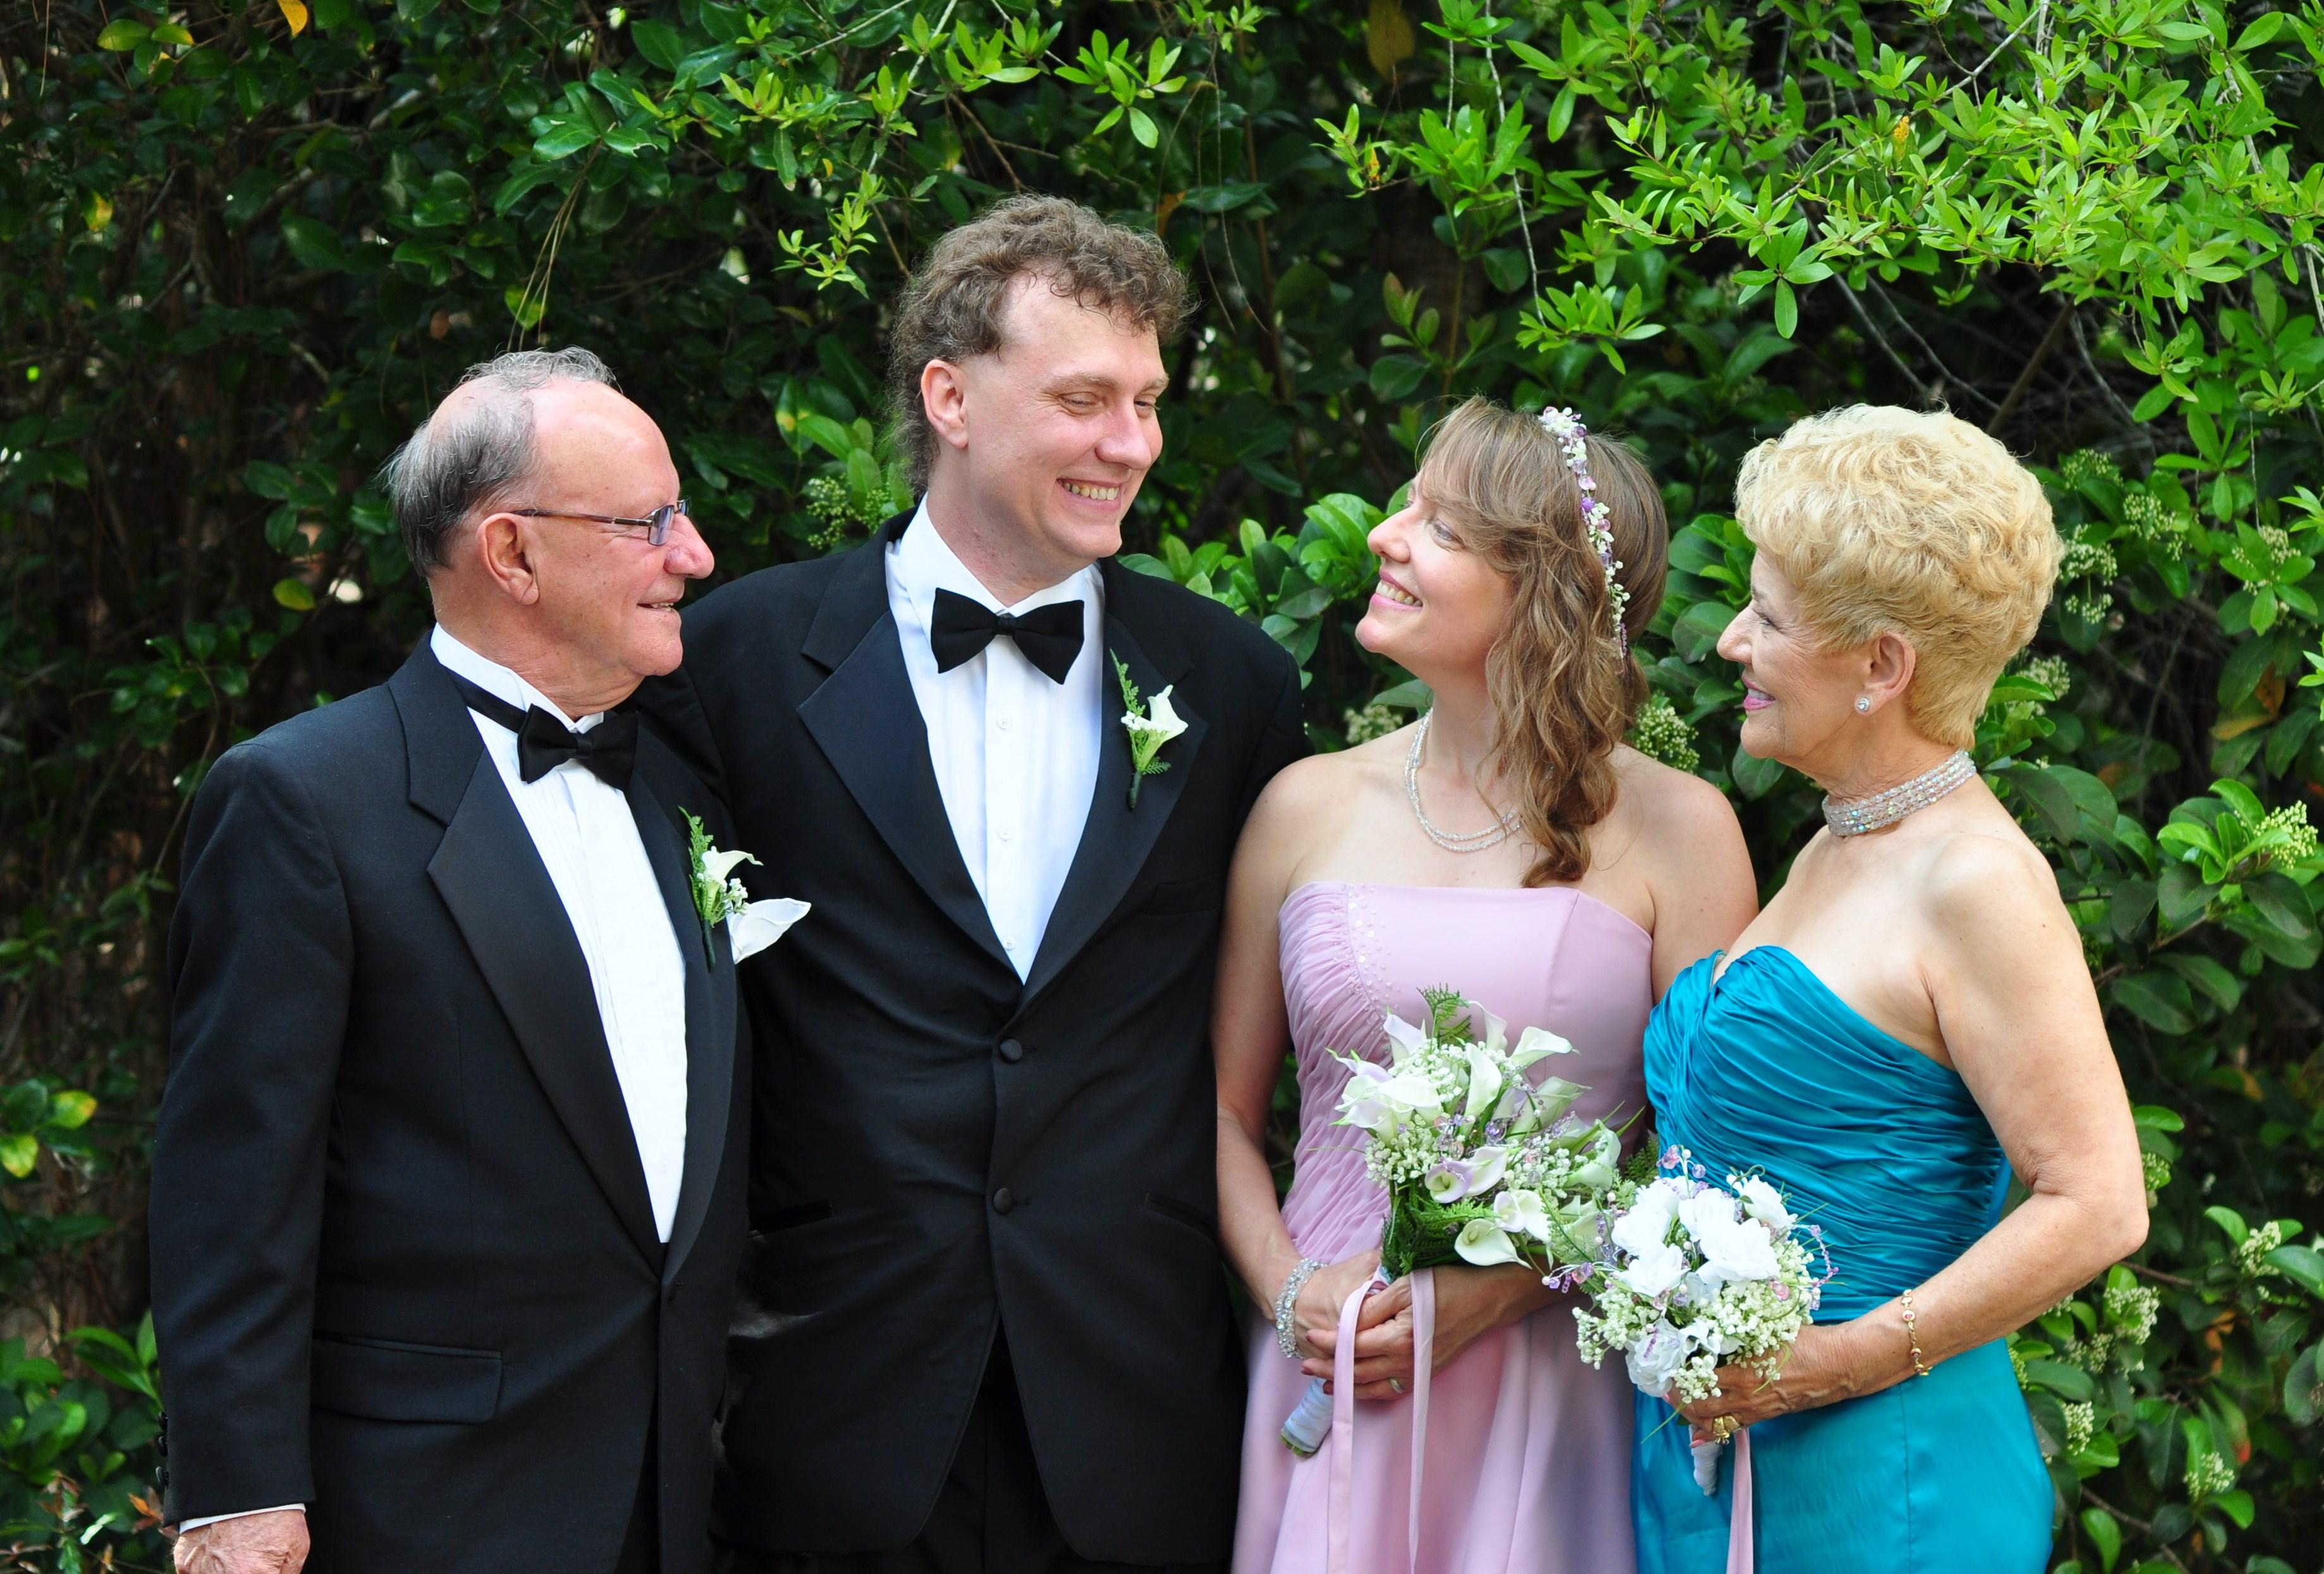 emily-and-travis-4-1-2013-april-fools-wedding-291